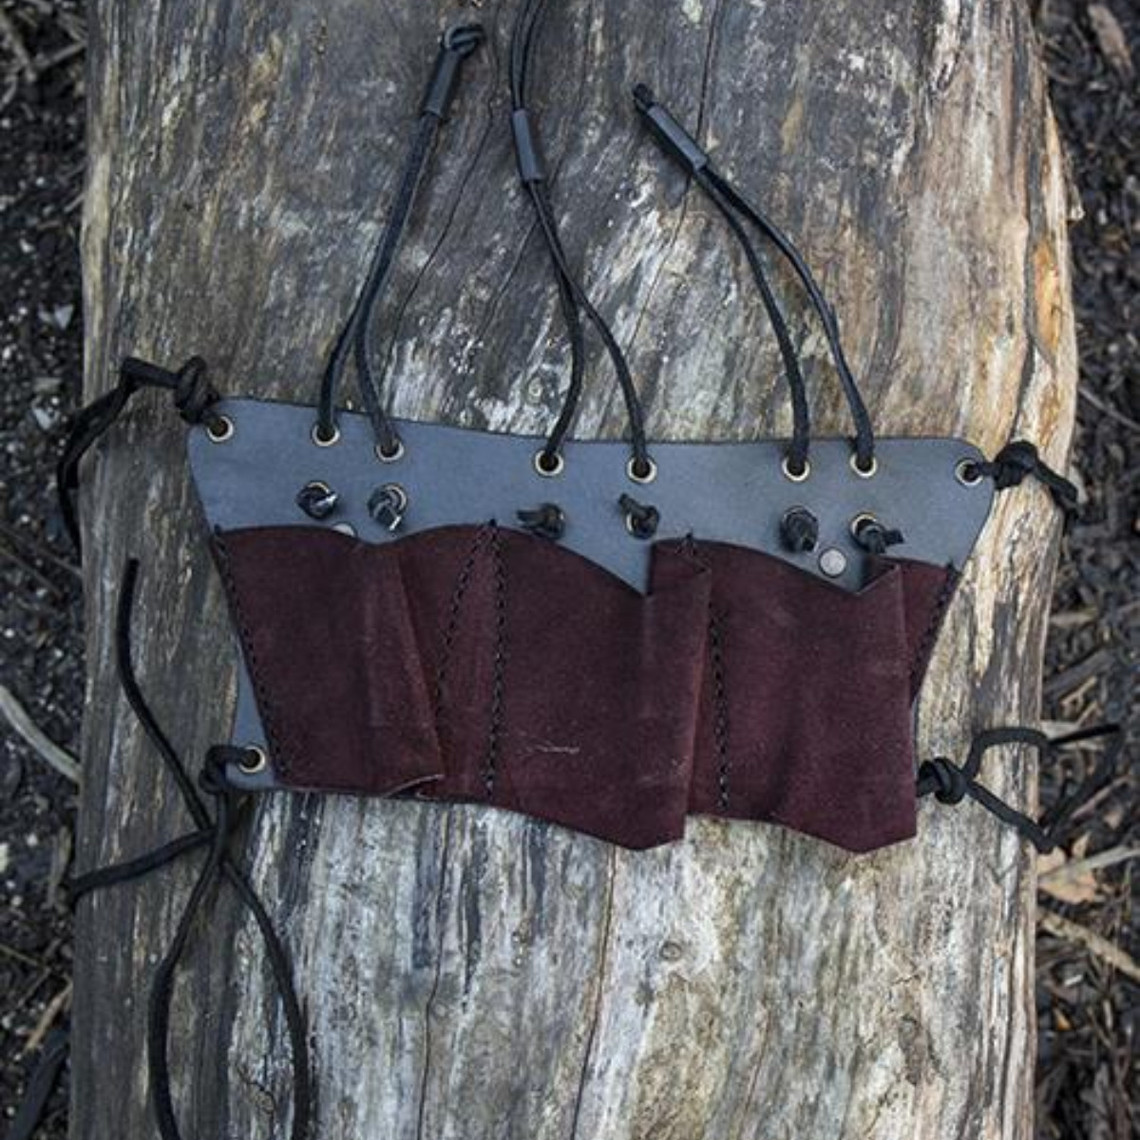 Epic Armoury Cinturón para 3 cuchillos de lanzar LARP, marrón.